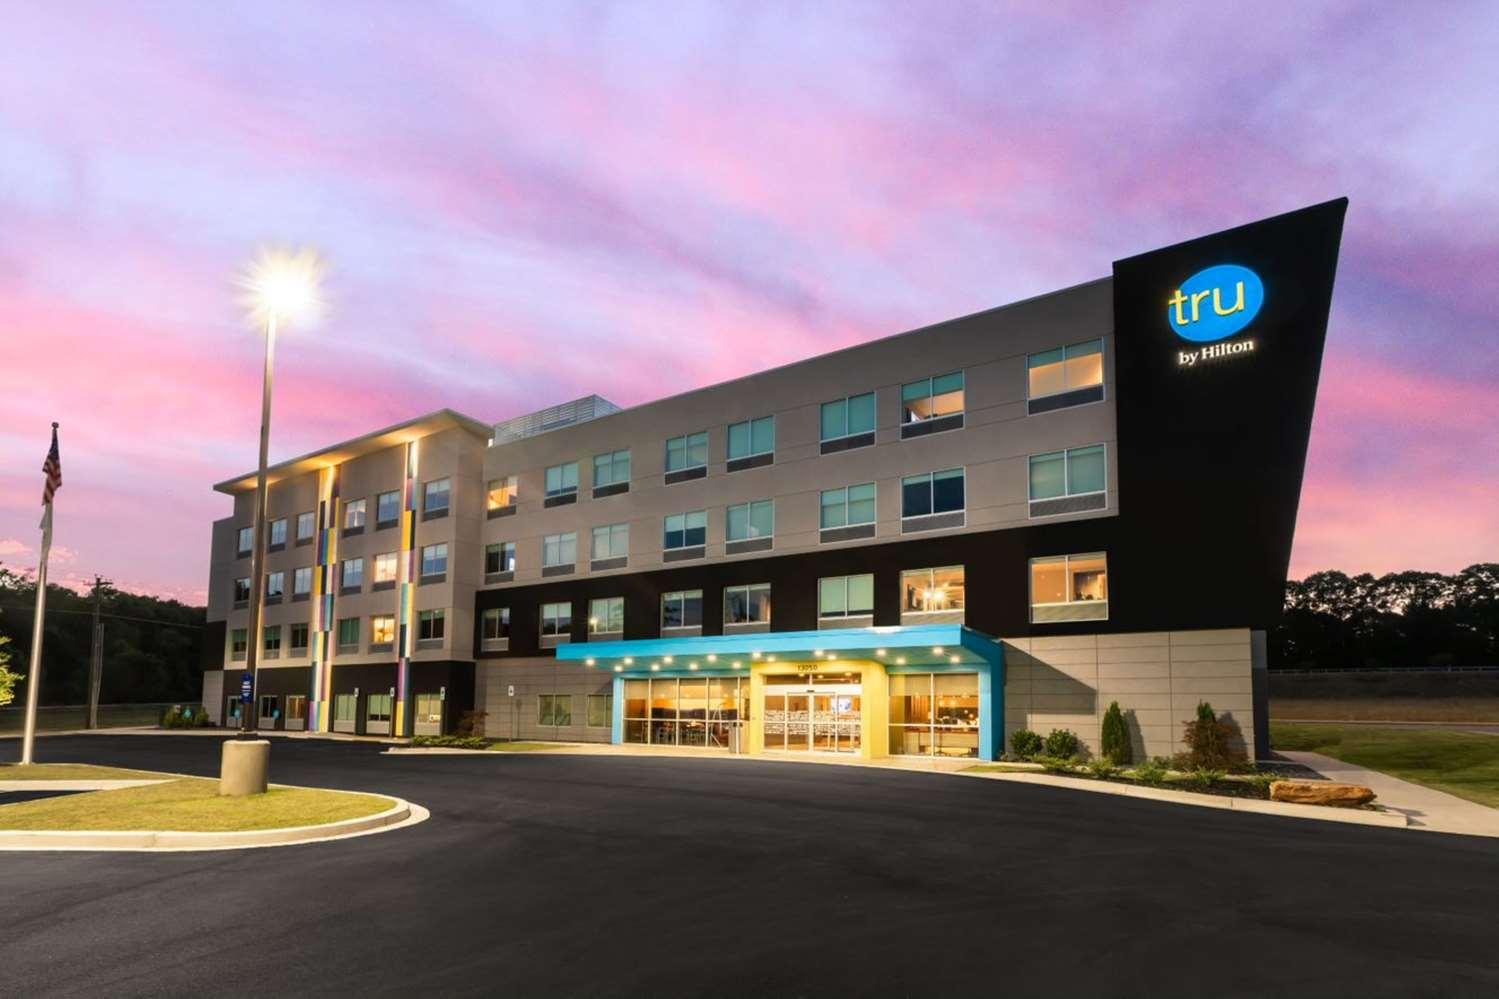 Tru by Hilton Seneca Clemson, SC